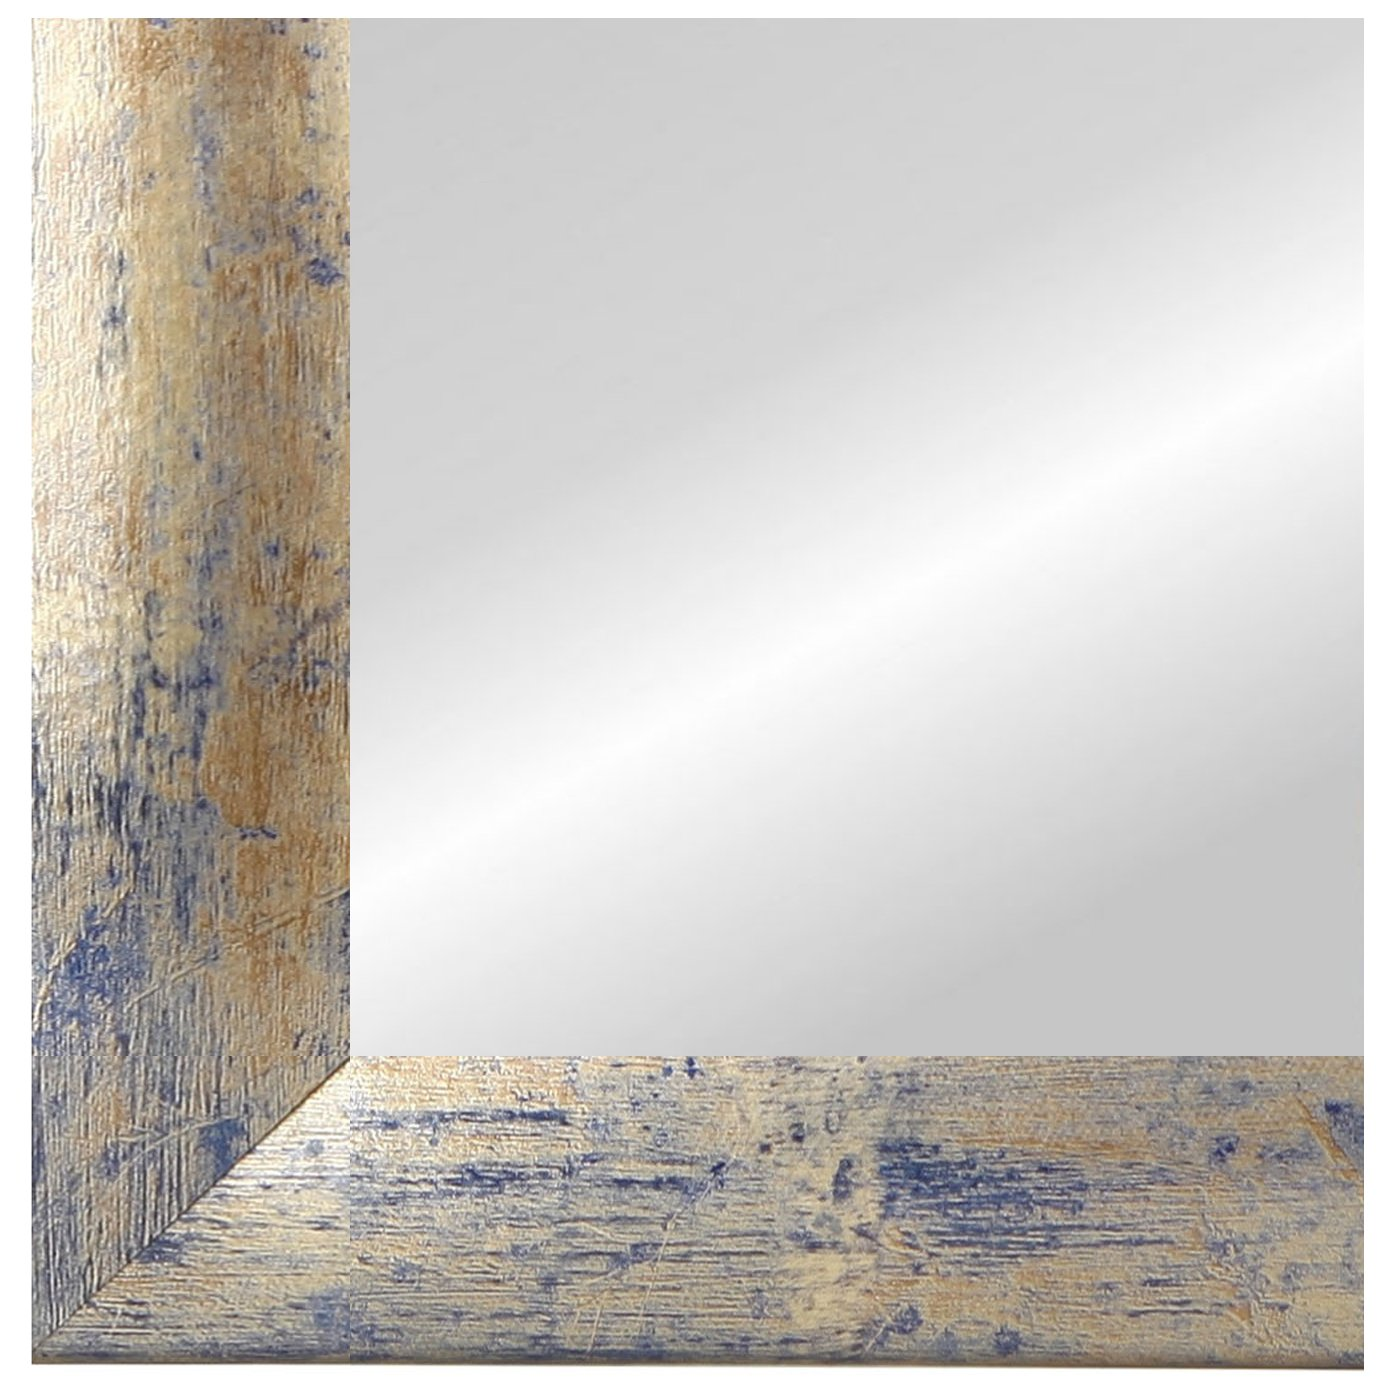 CAPRY 100 x 90 cm Spiegel nach Maß mit Rahmen, Rahmen Farbe: Weiss ...